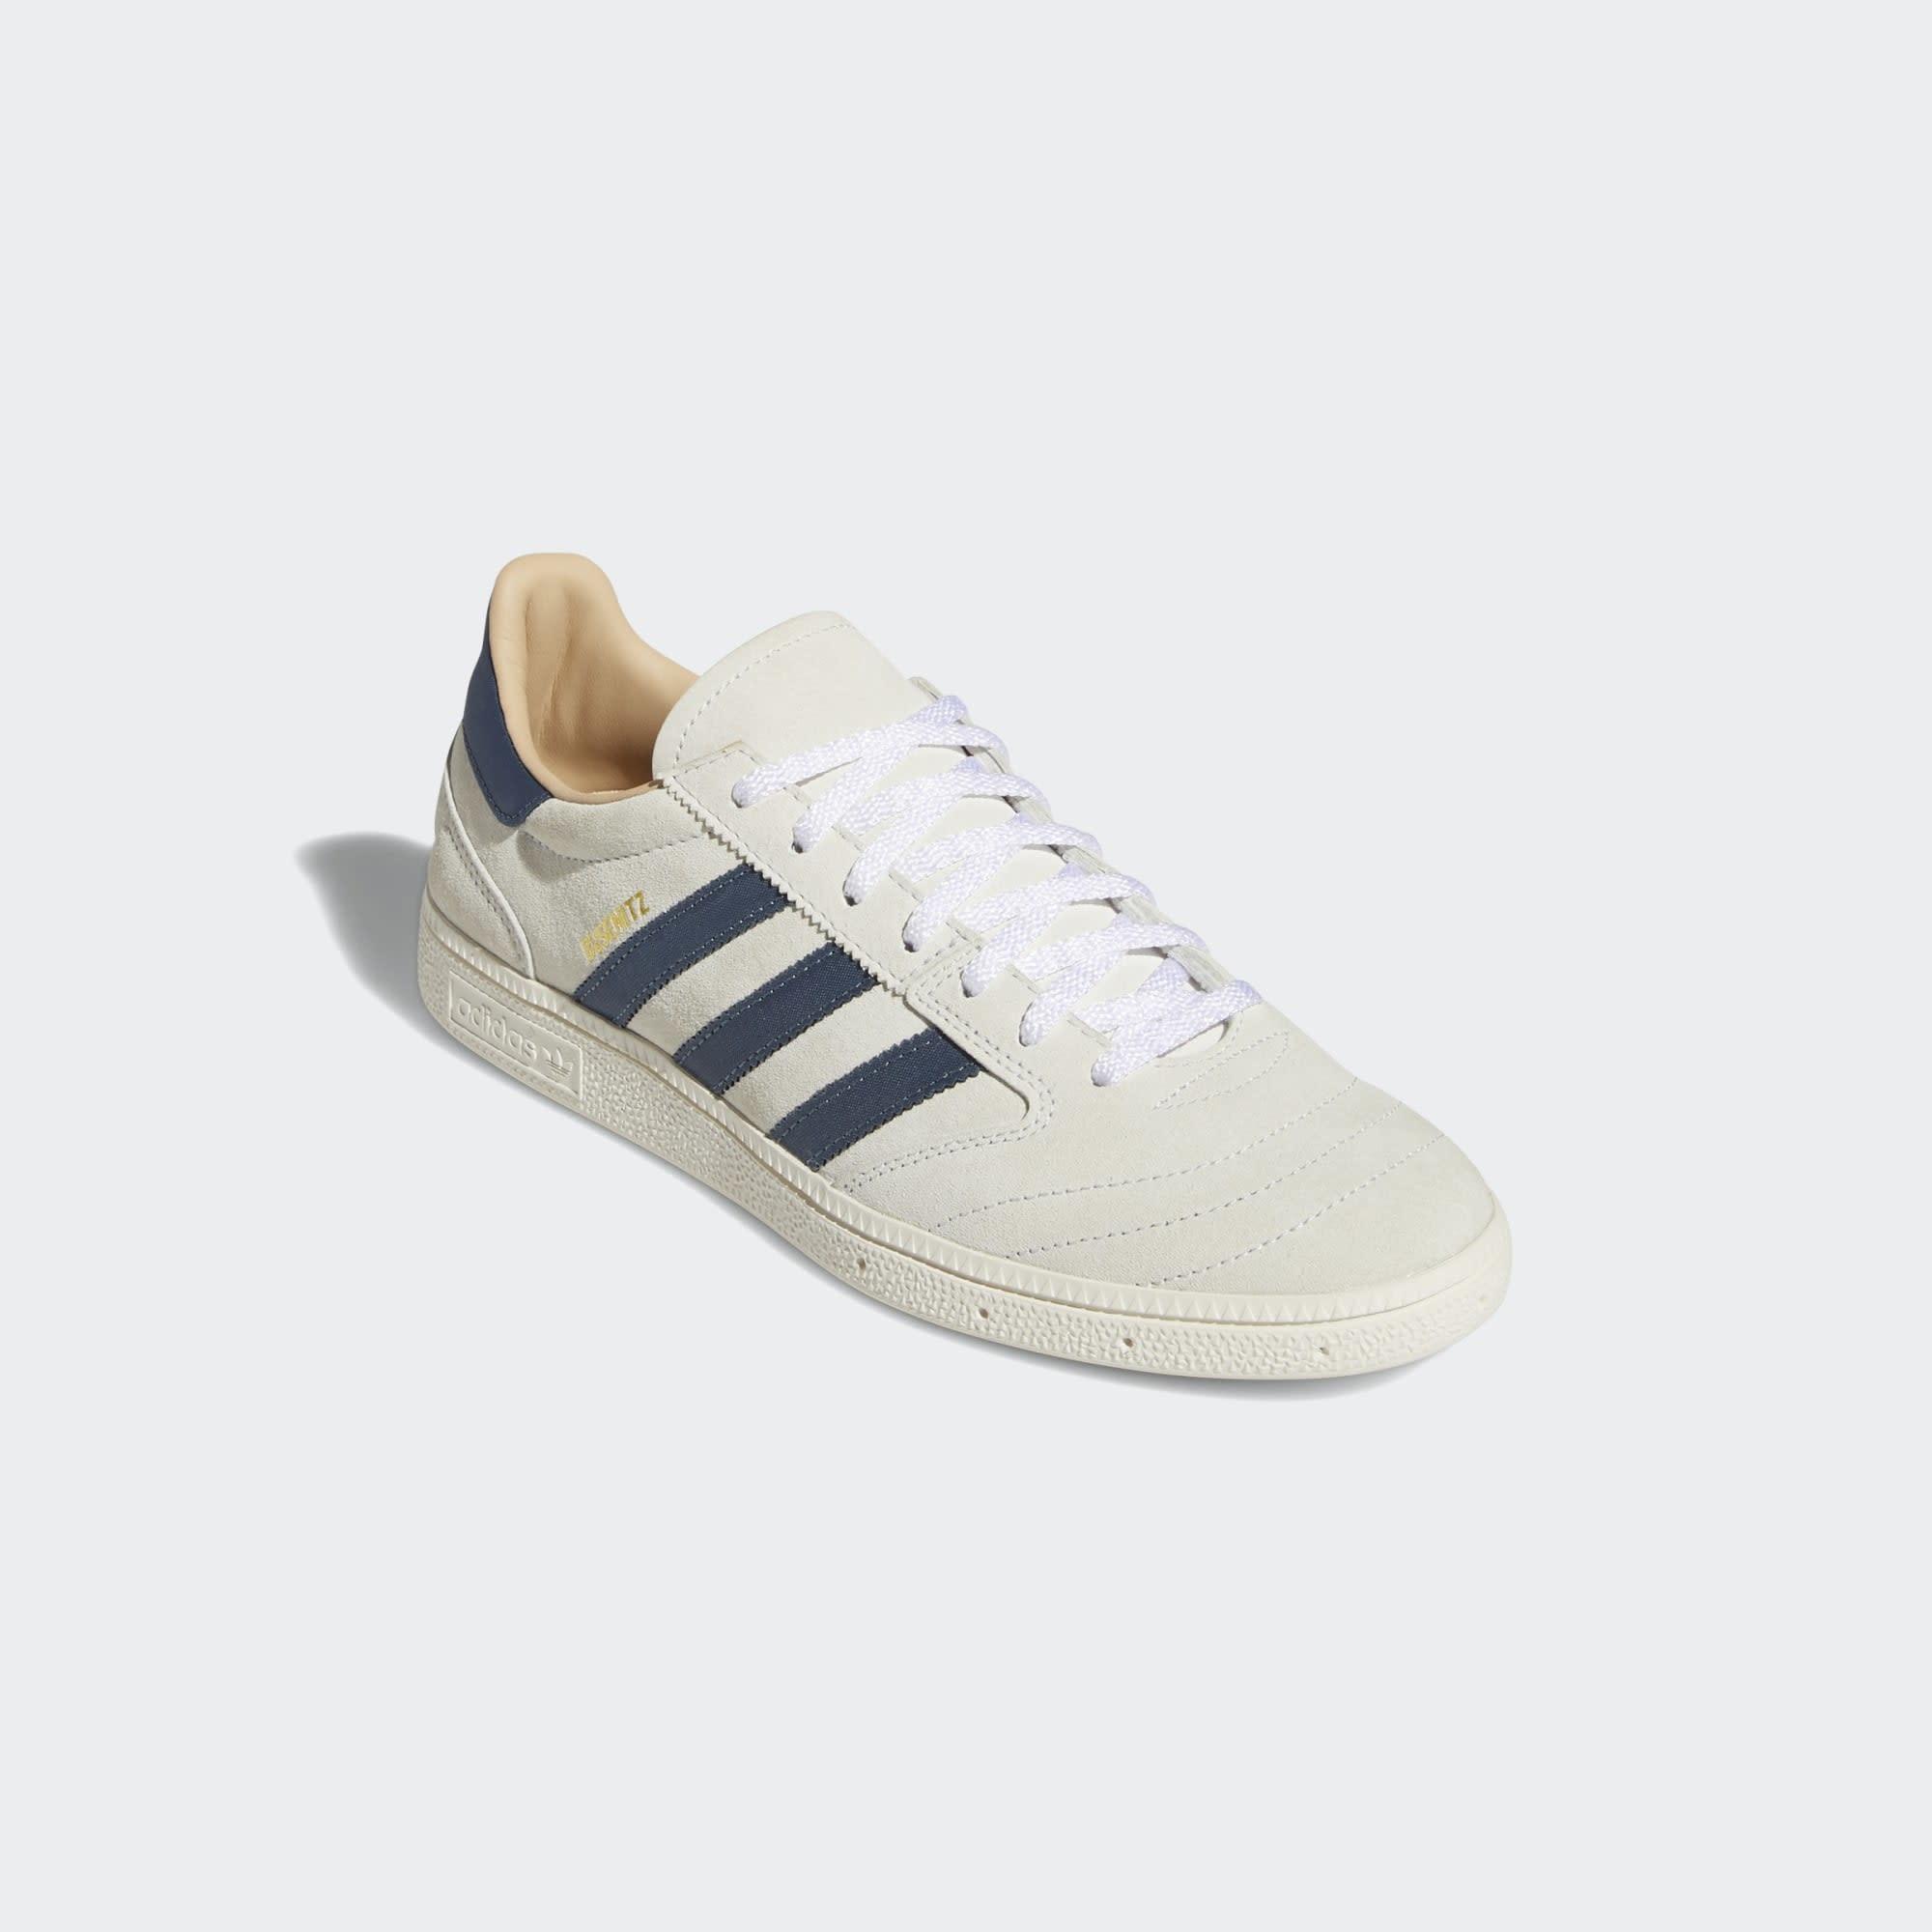 Adidas Busenitz Vintage Crystal White/Blue